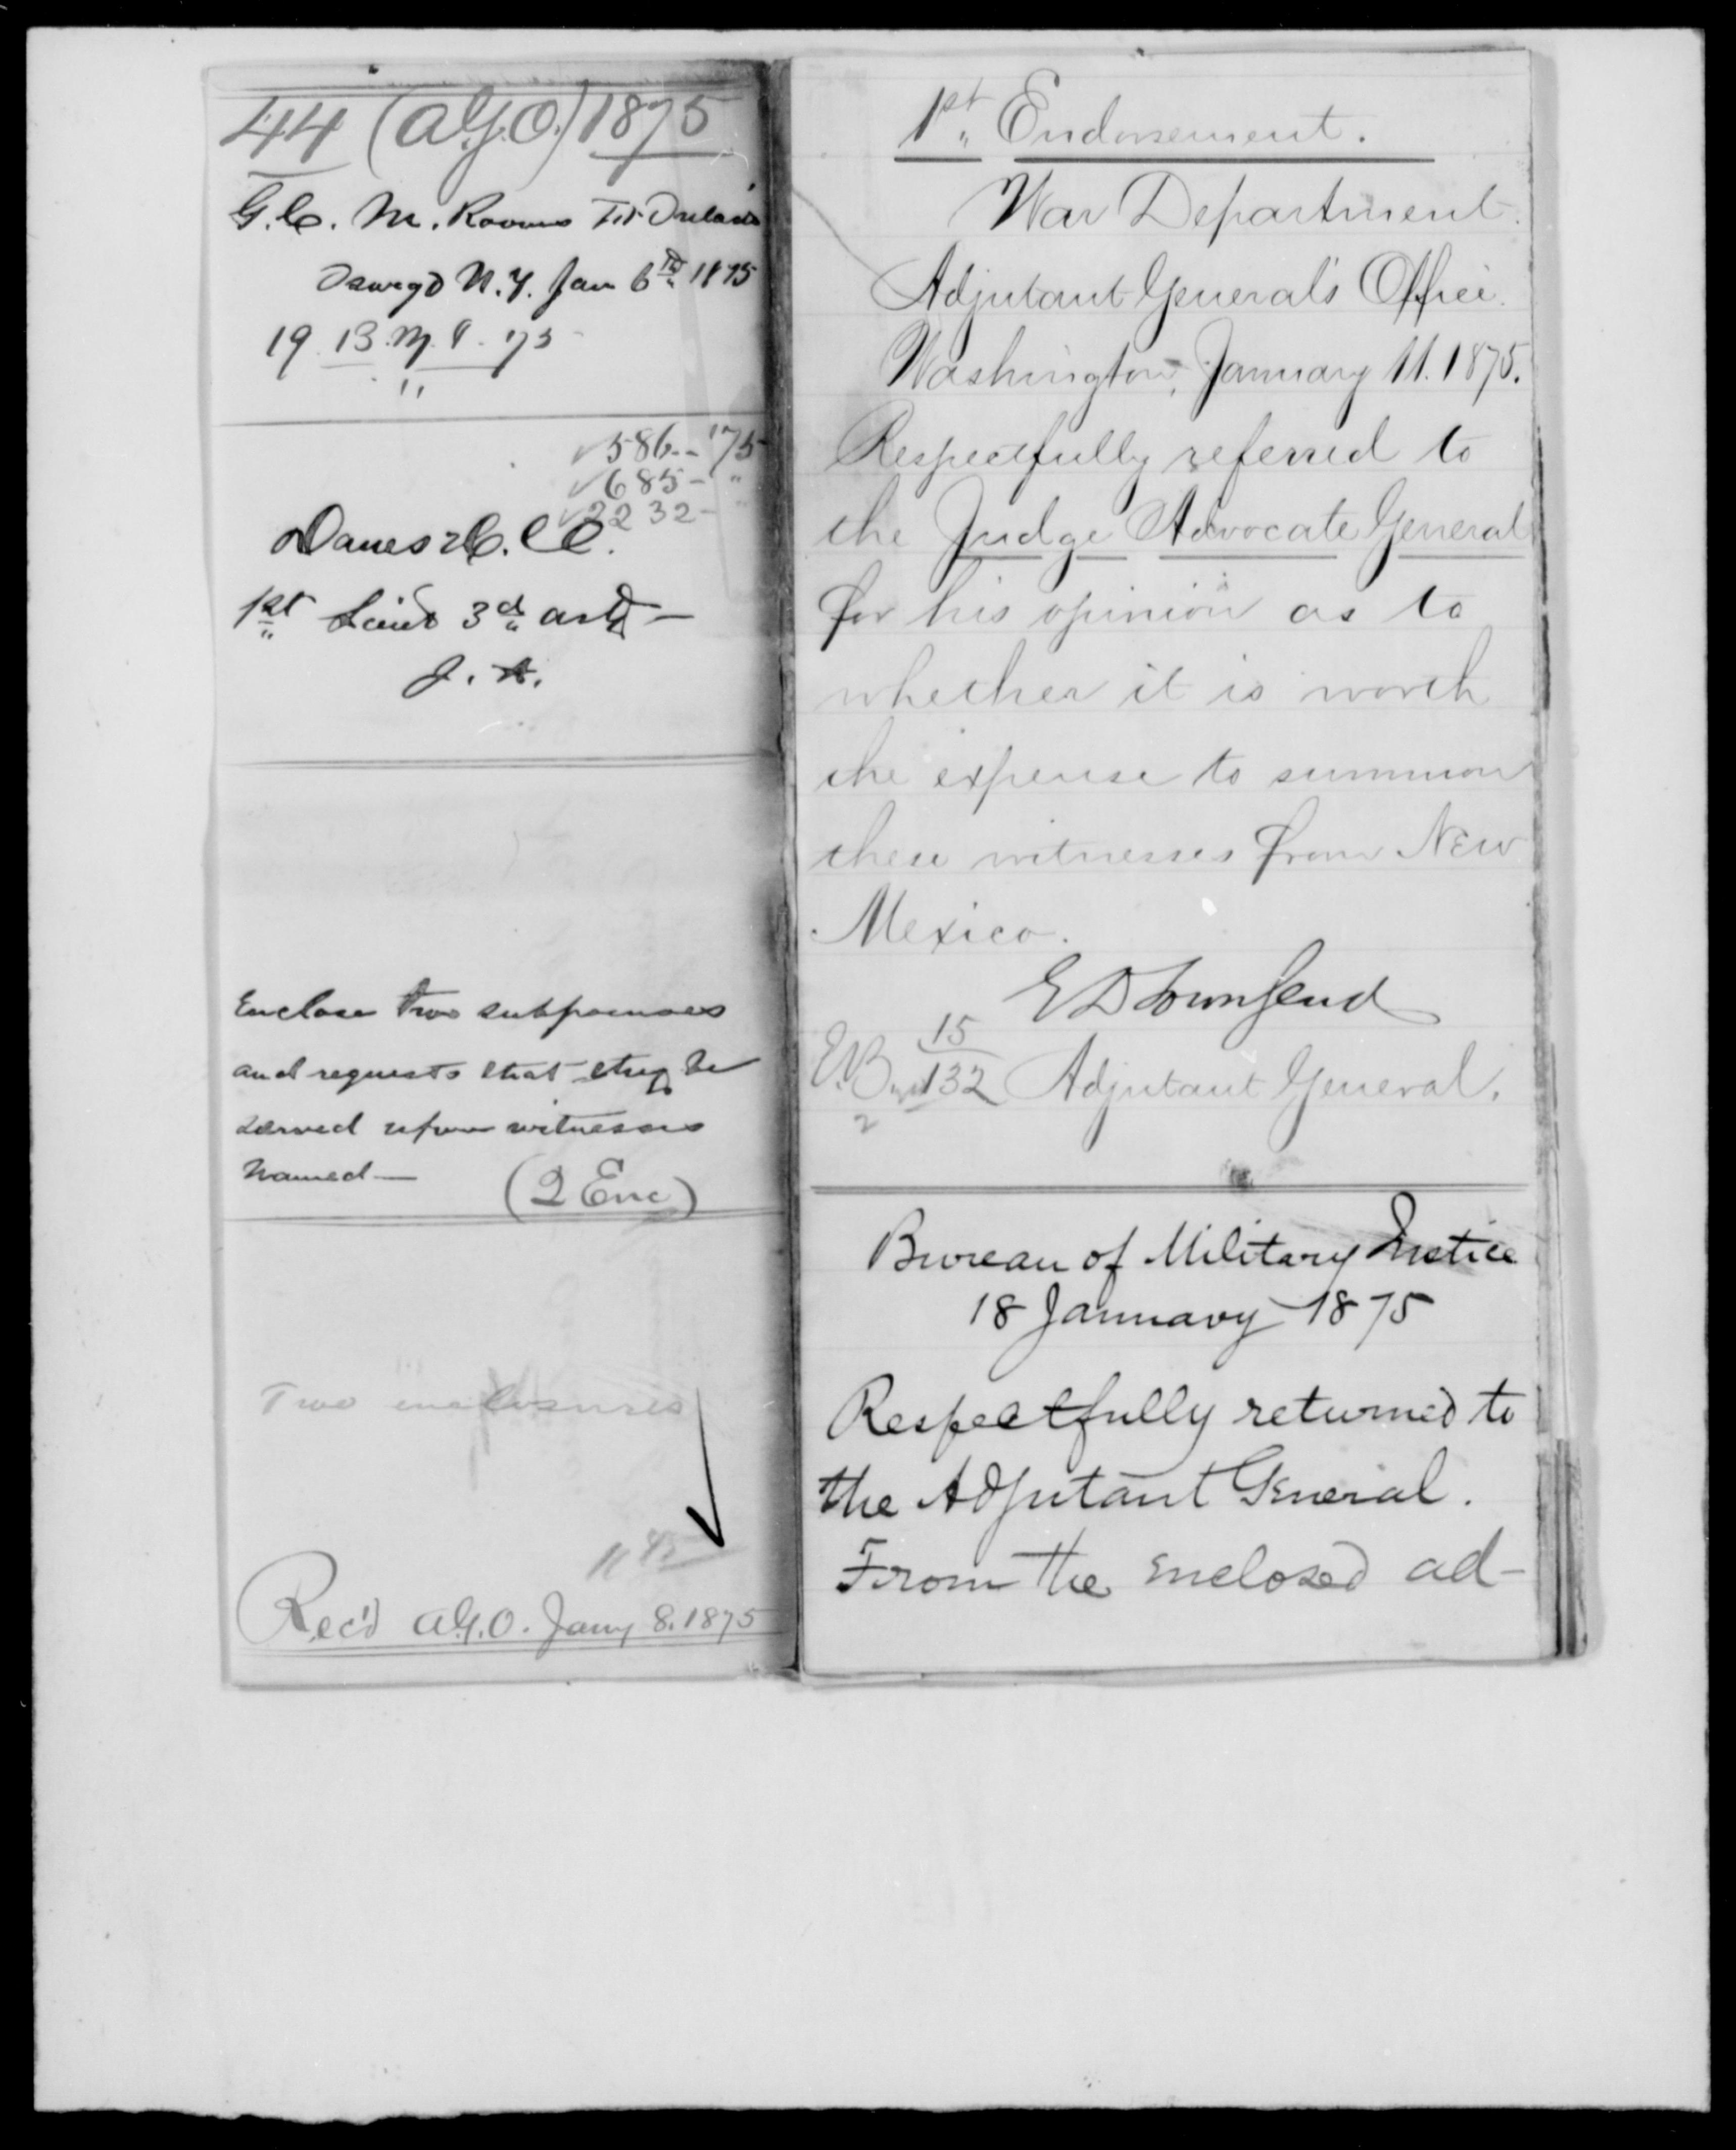 1875 - File No. 44 (Danes, H C - New York)